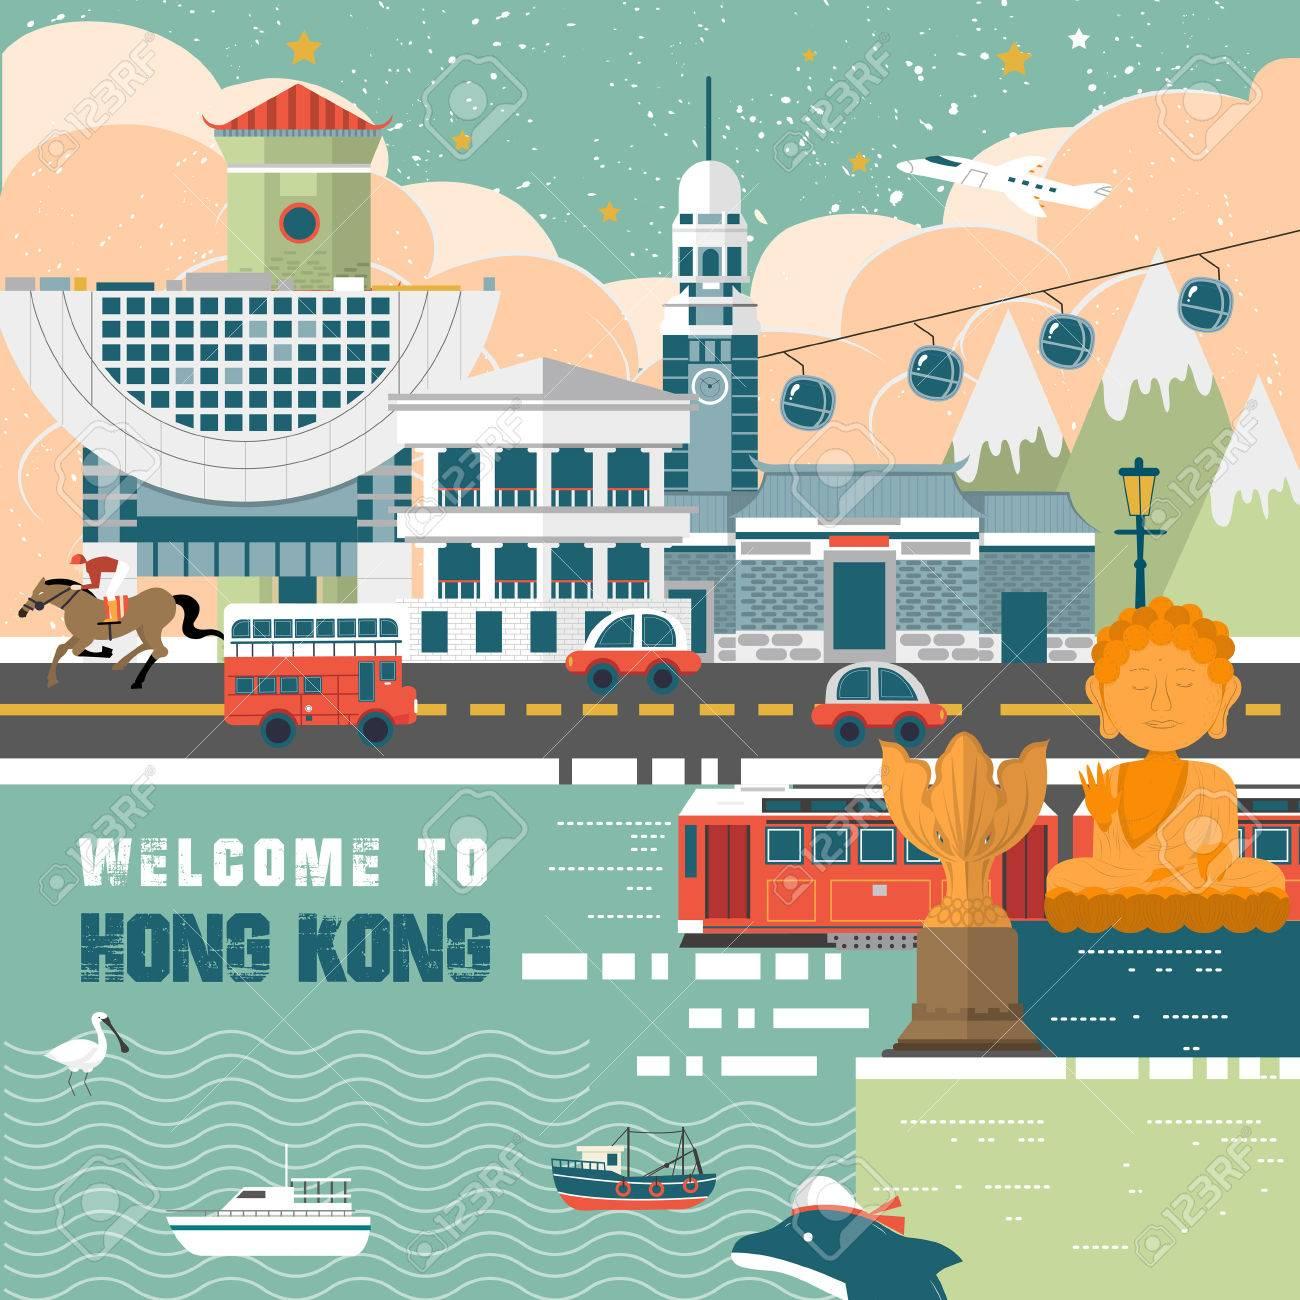 Poster design hong kong - Vector Attractive Hong Kong Travel Concept Poster In Flat Design Style